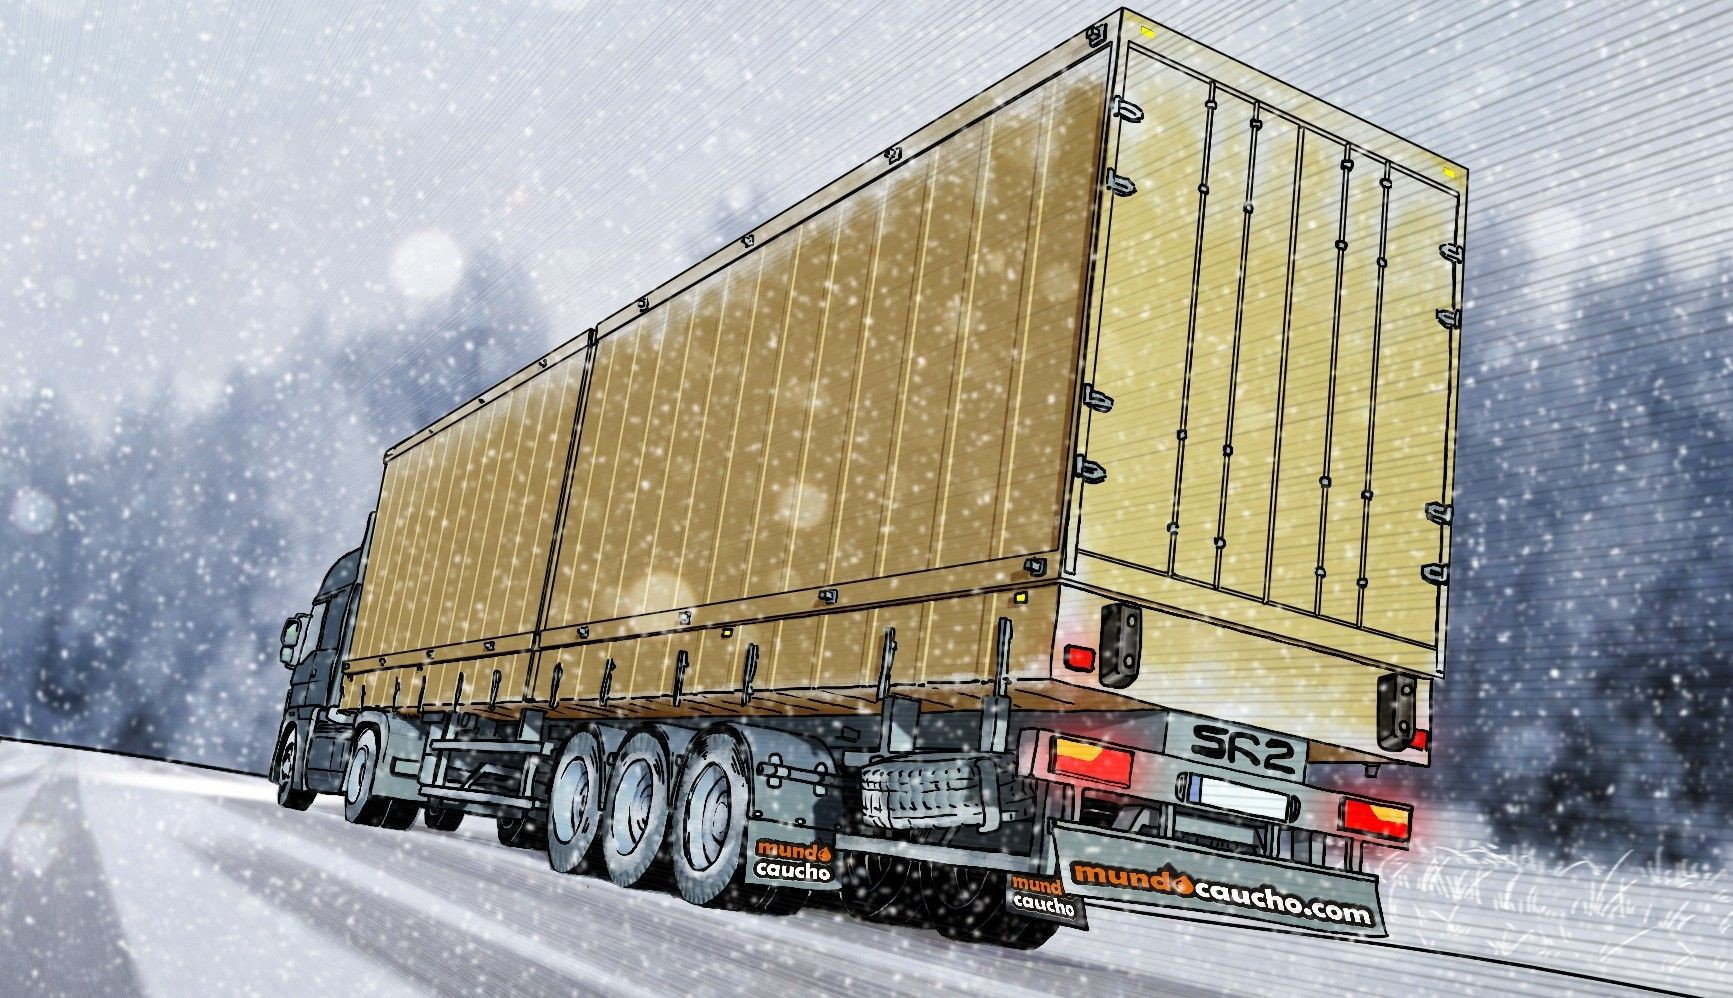 camion-mundo-caucho-4